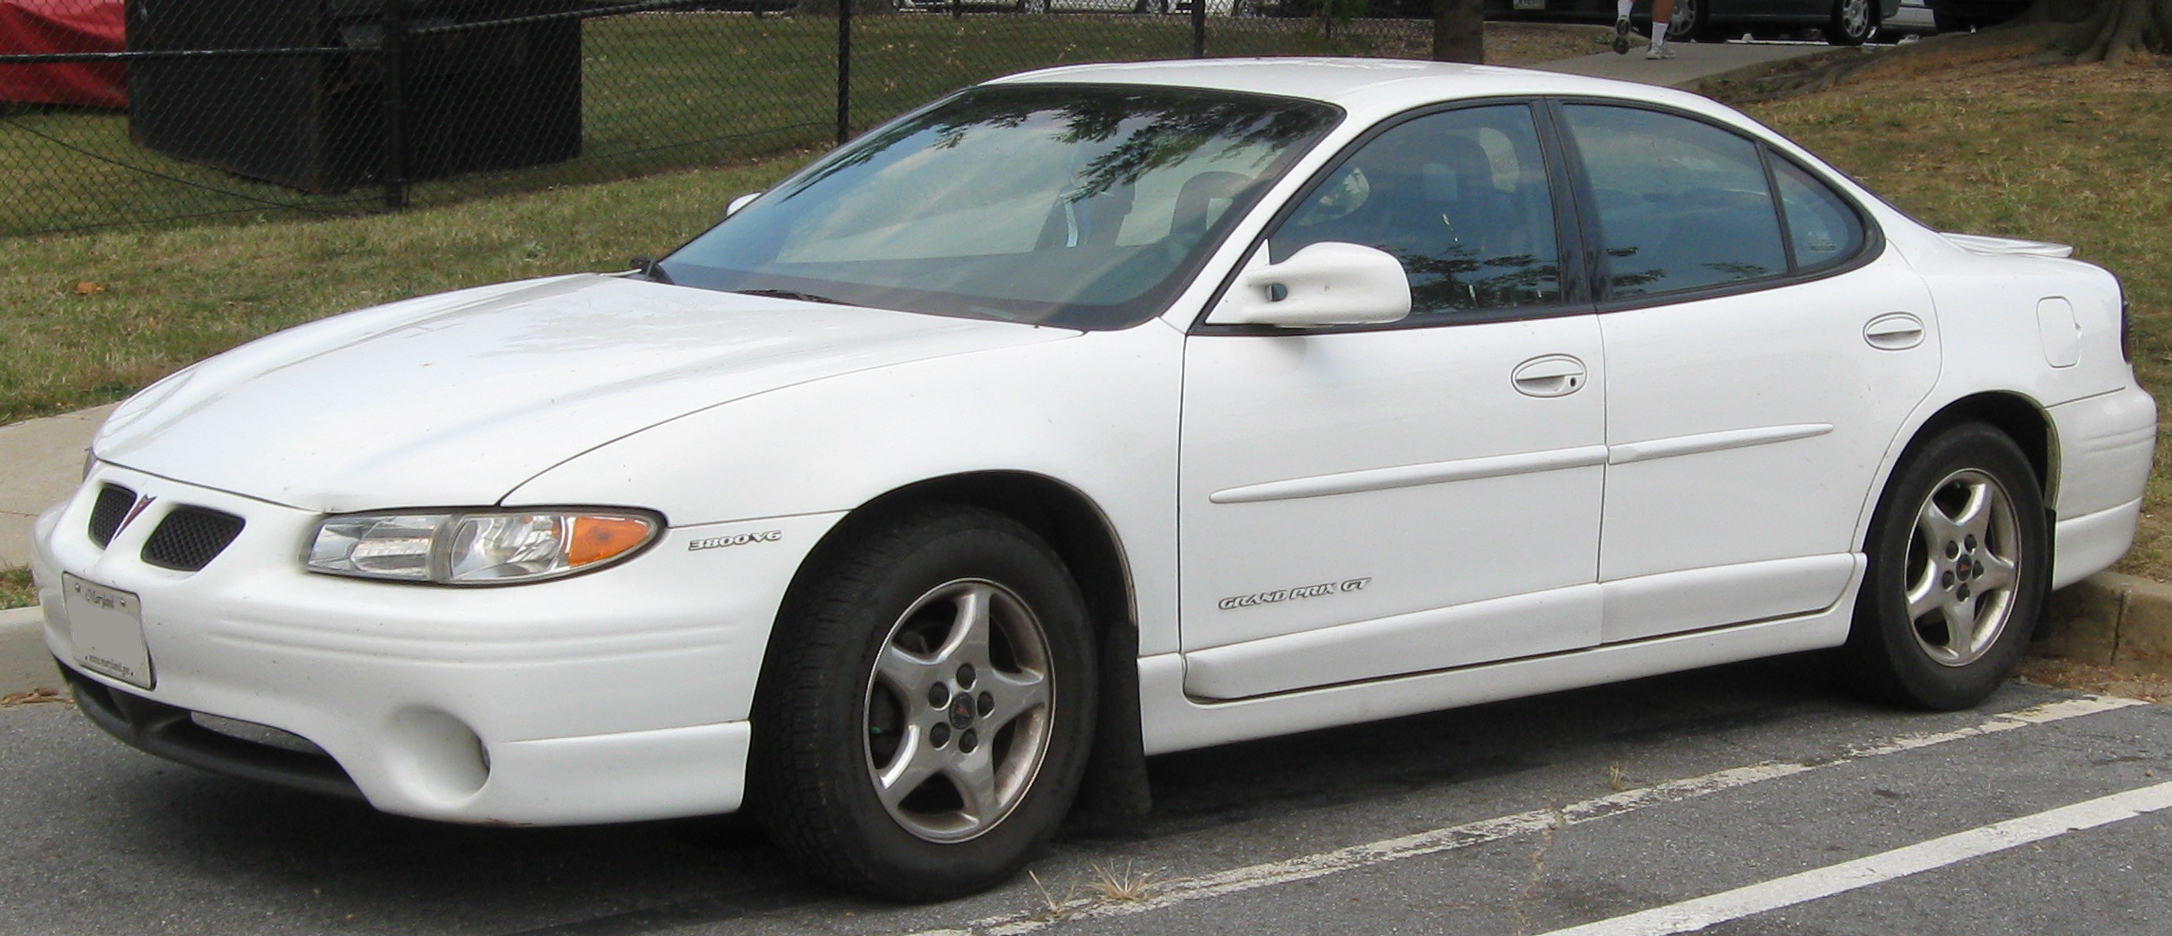 Pontiac Grand Prix Sports Car